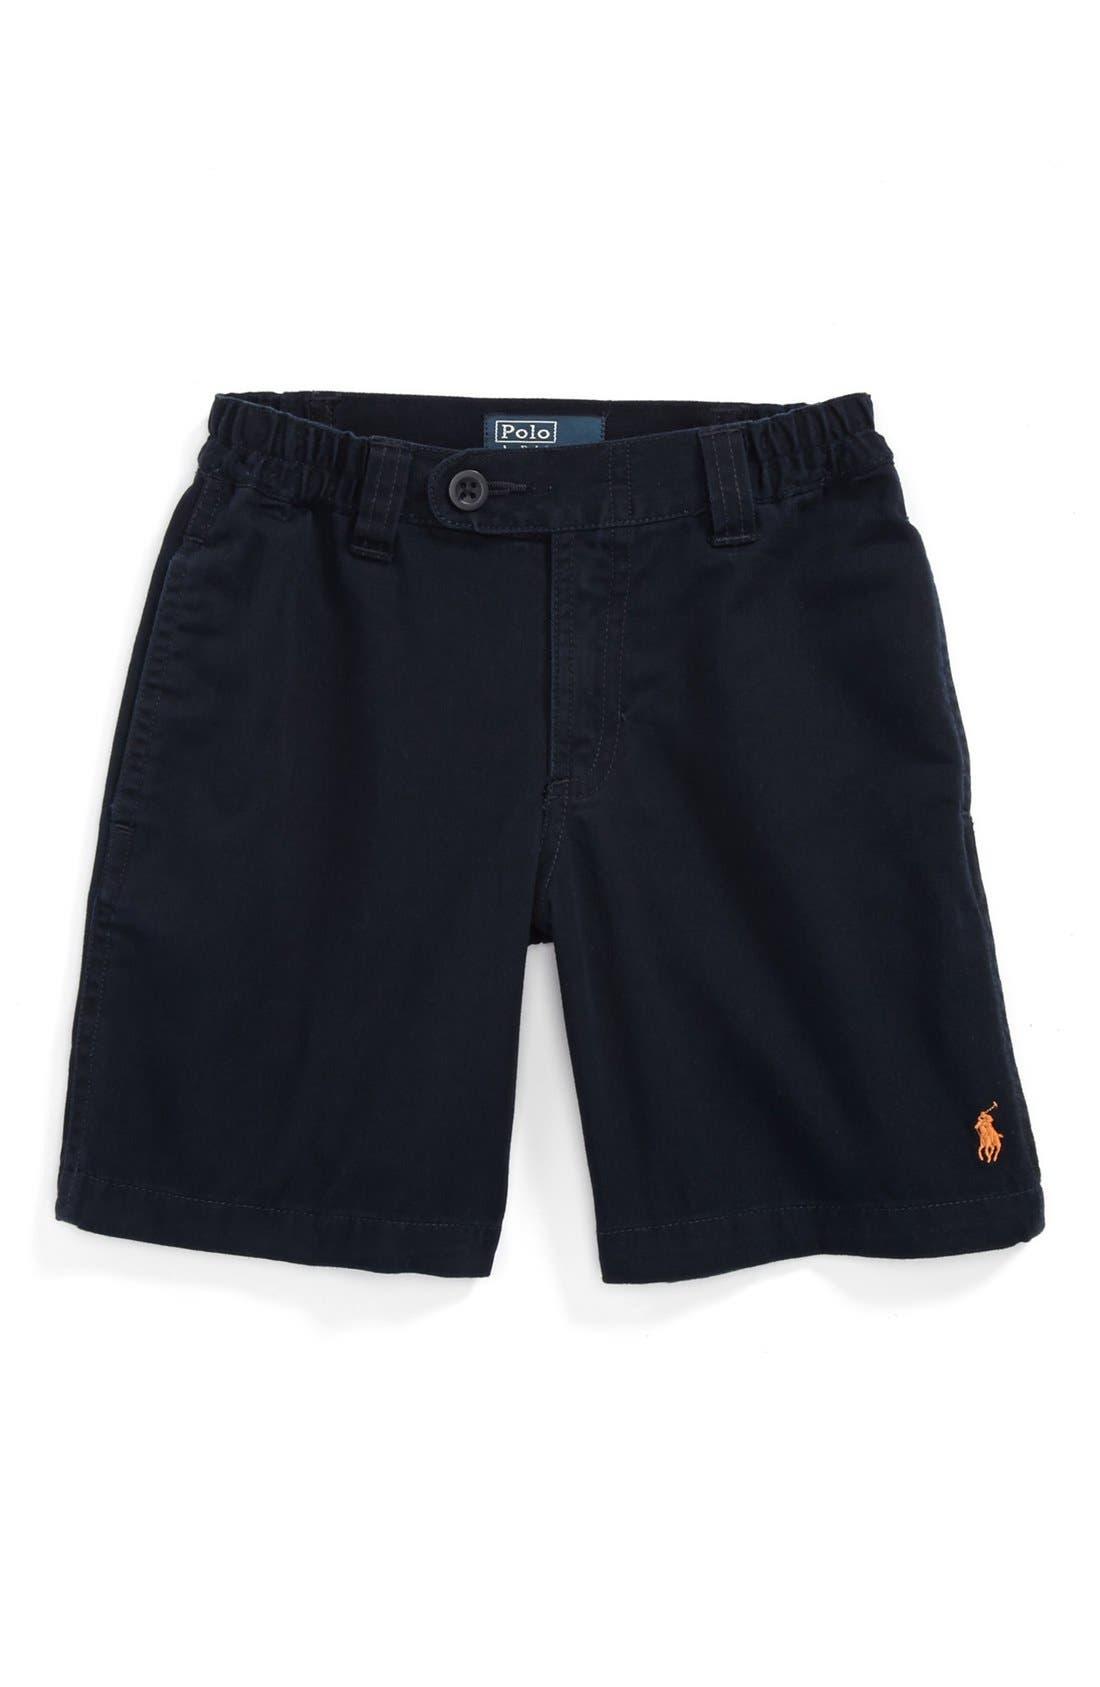 Main Image - Ralph Lauren 'Prospect' Shorts (Toddler Boys)